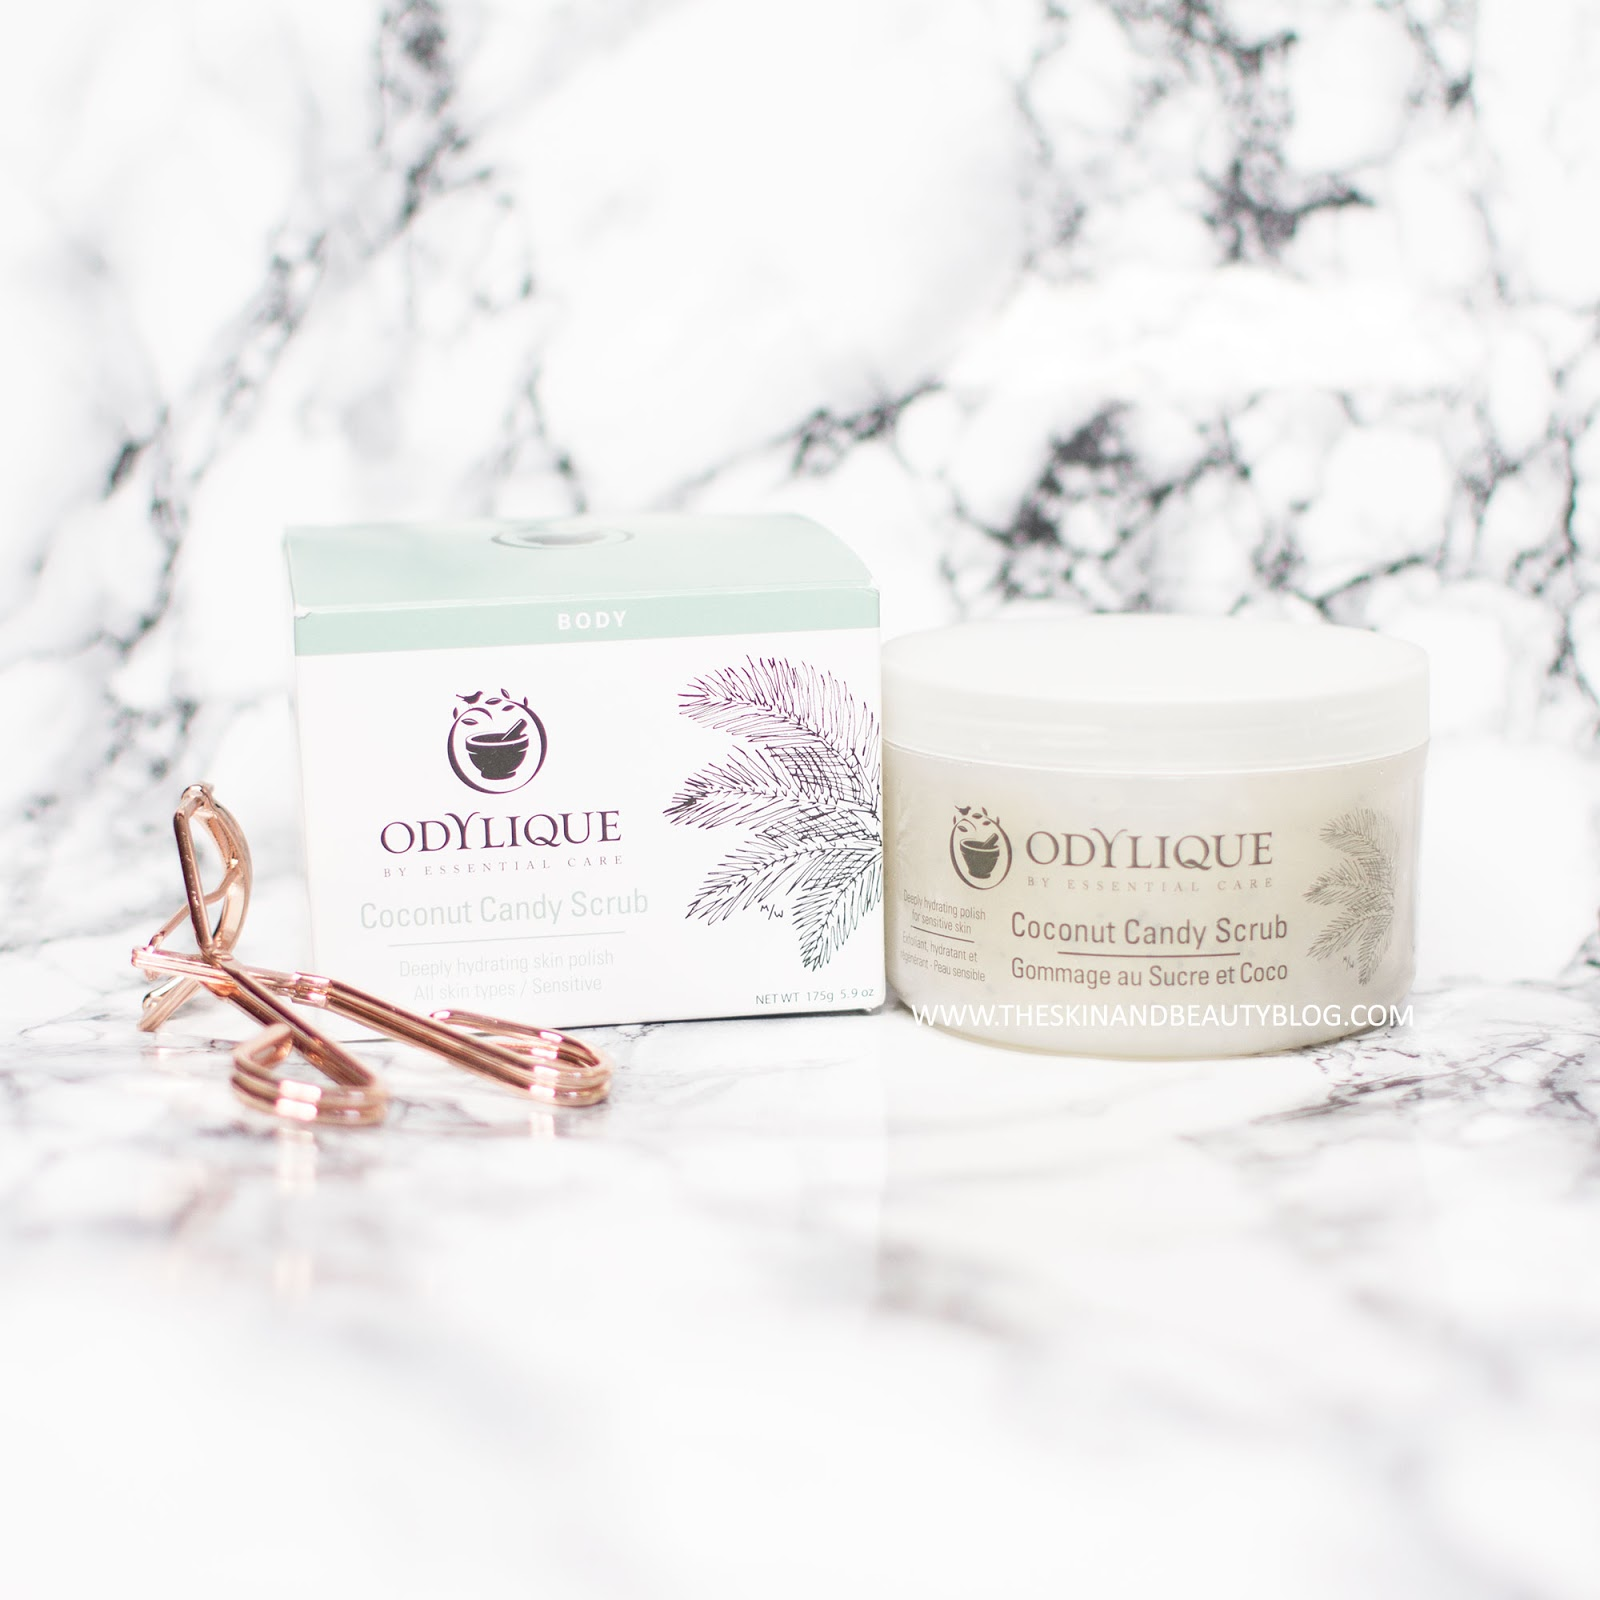 Odylique Organic Coconut Candy Scrub Review